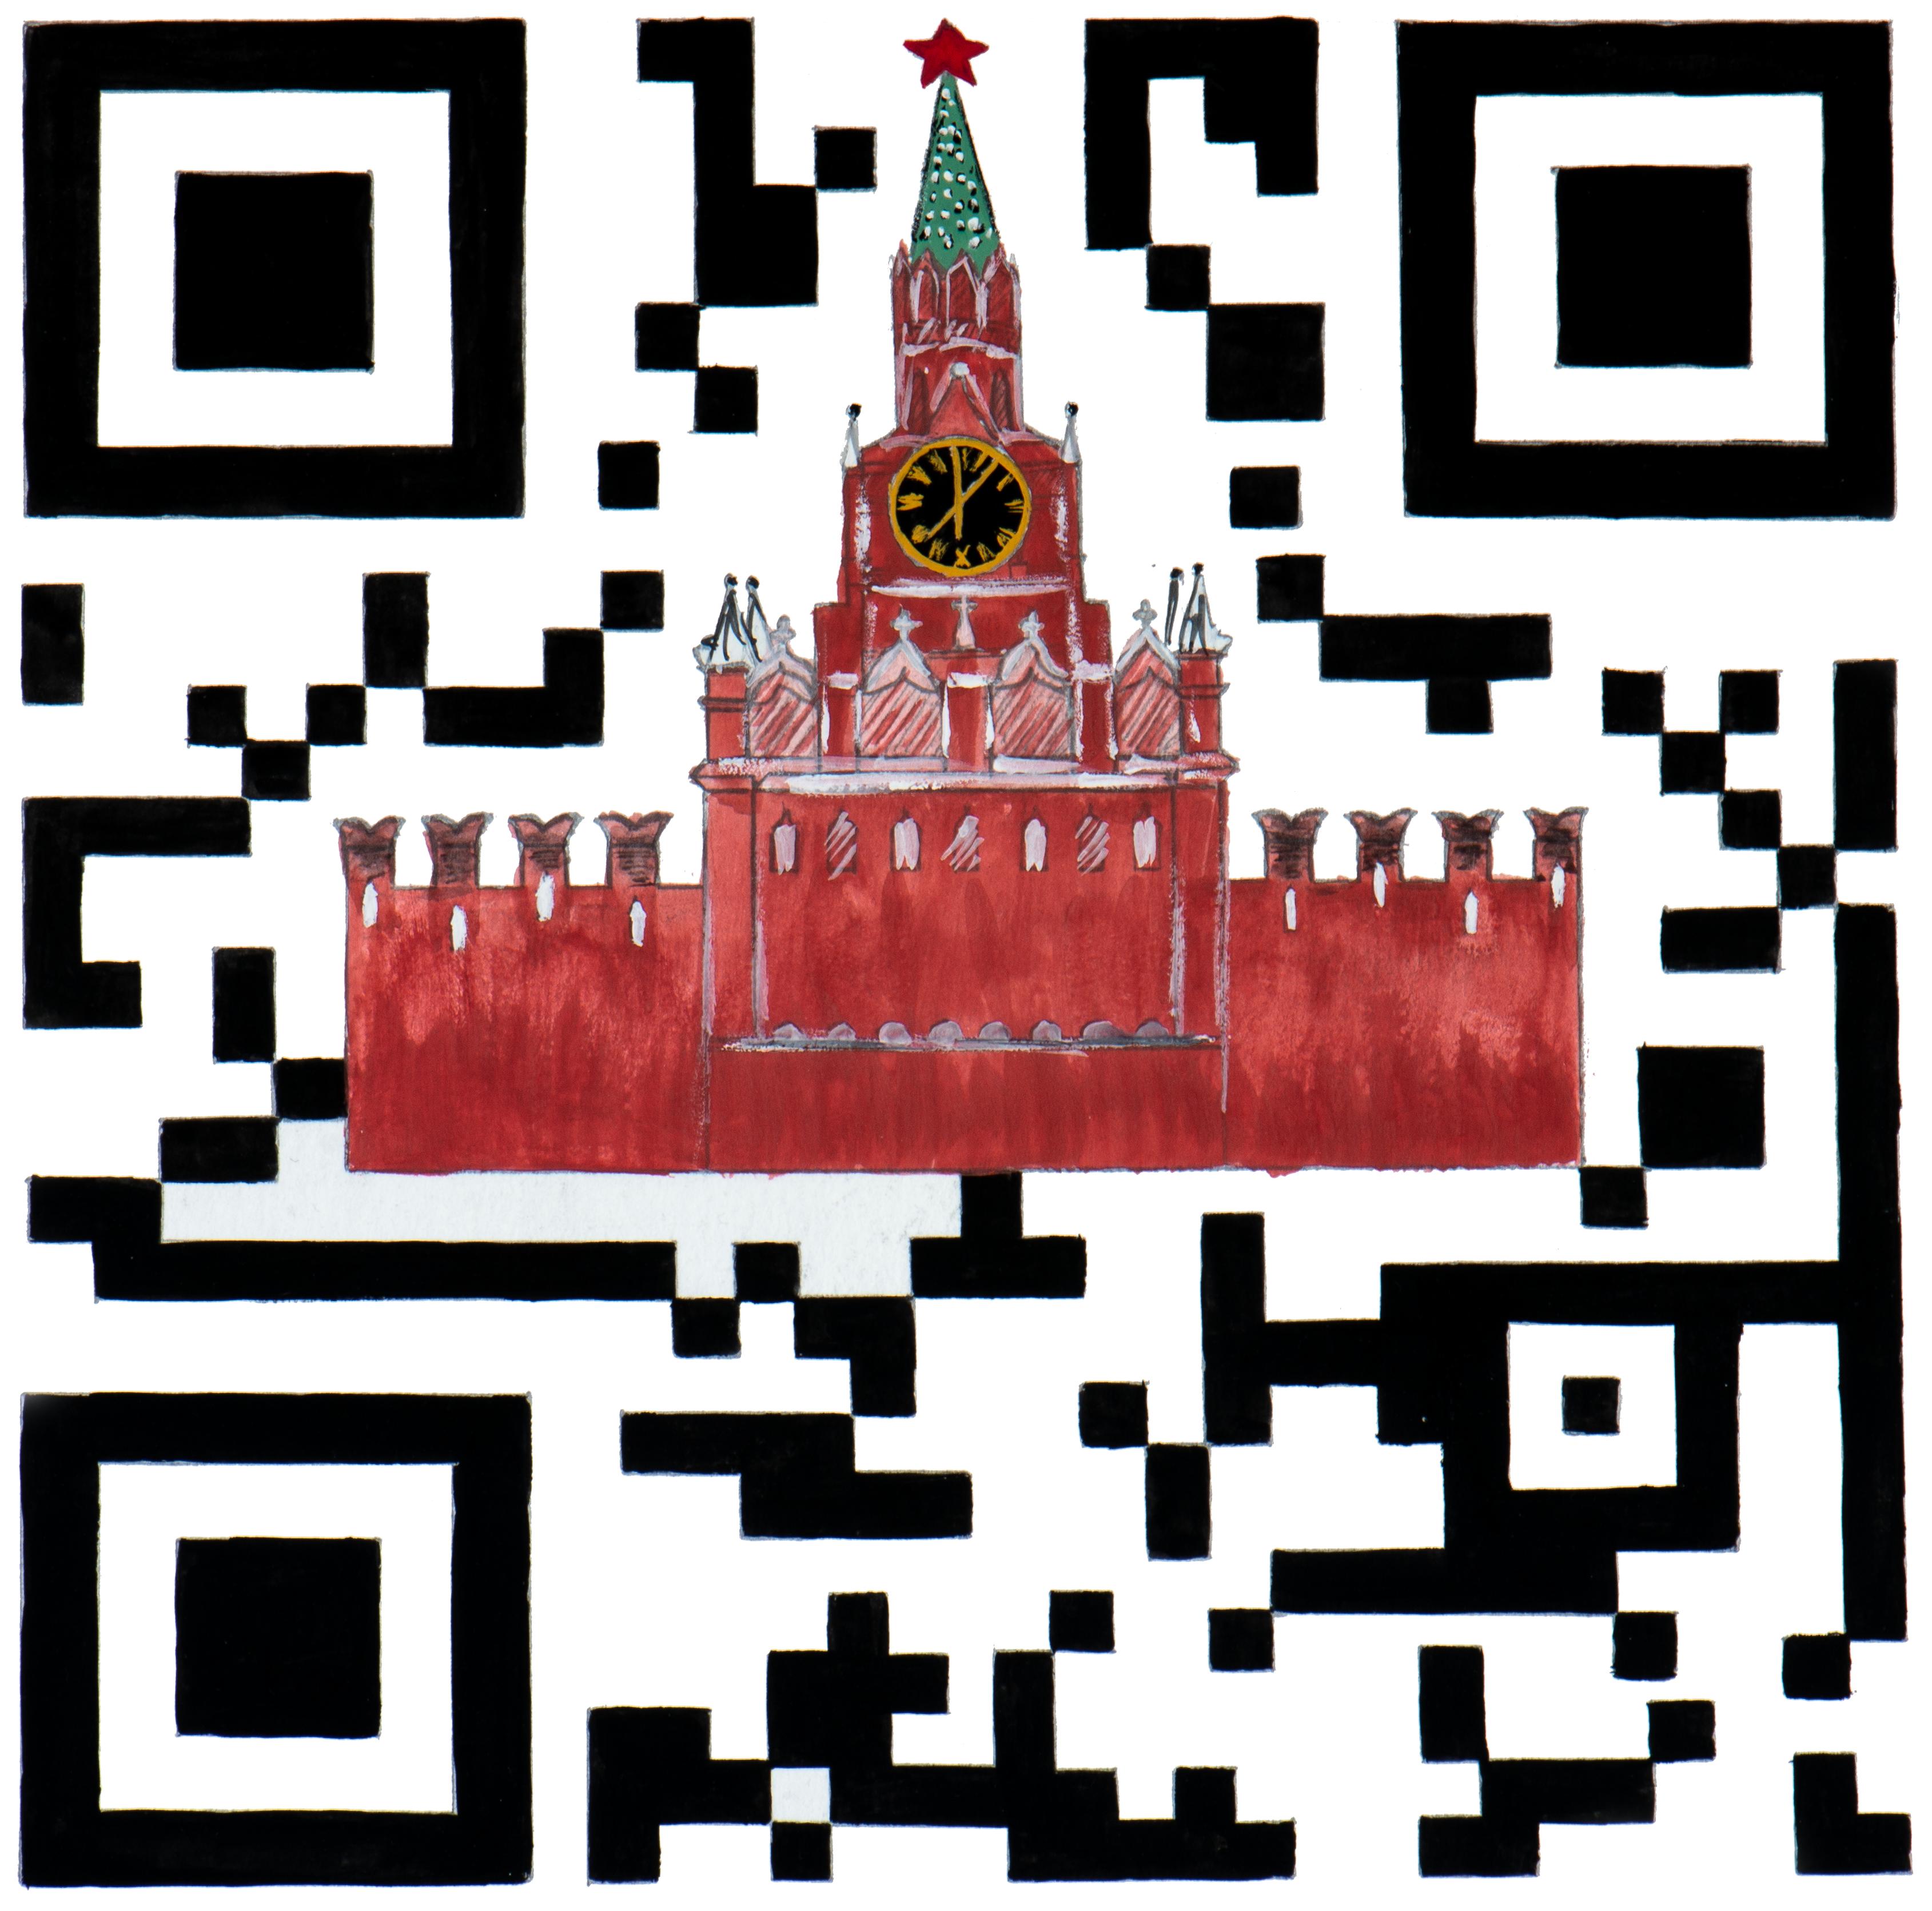 QR Code illustration with the Kremlin